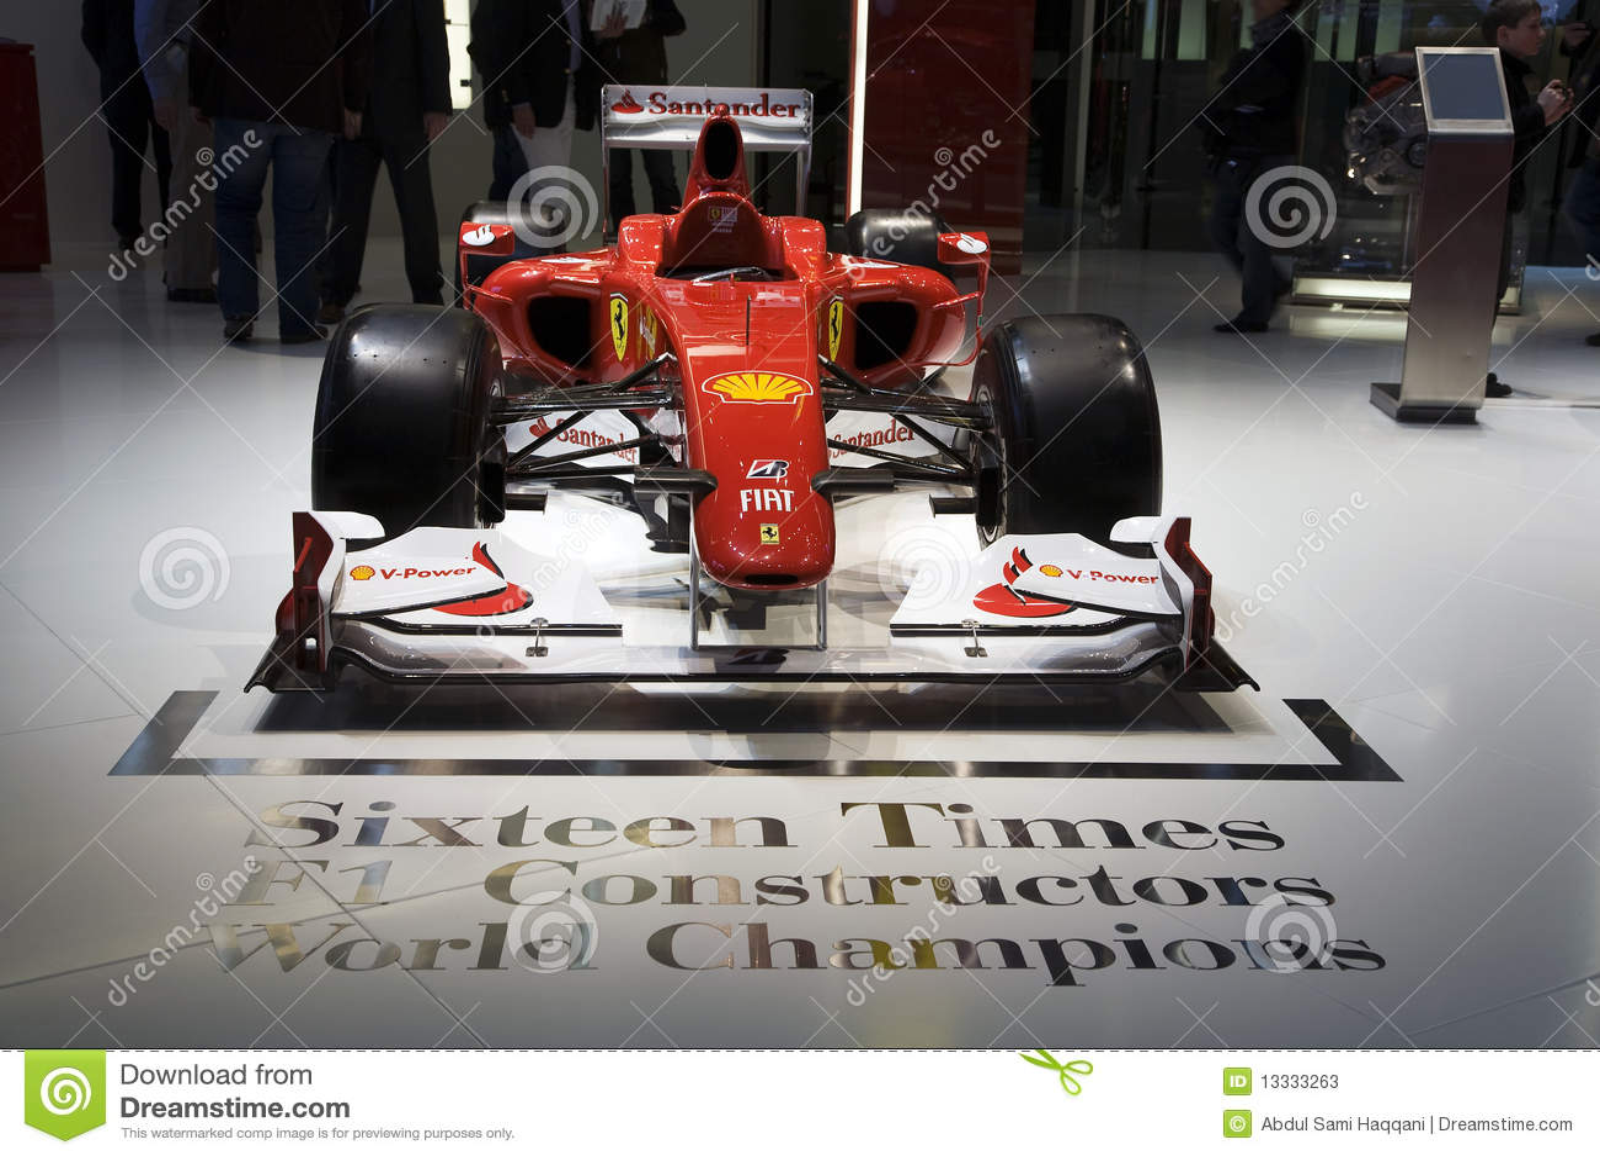 Ferrari F10 Formula One